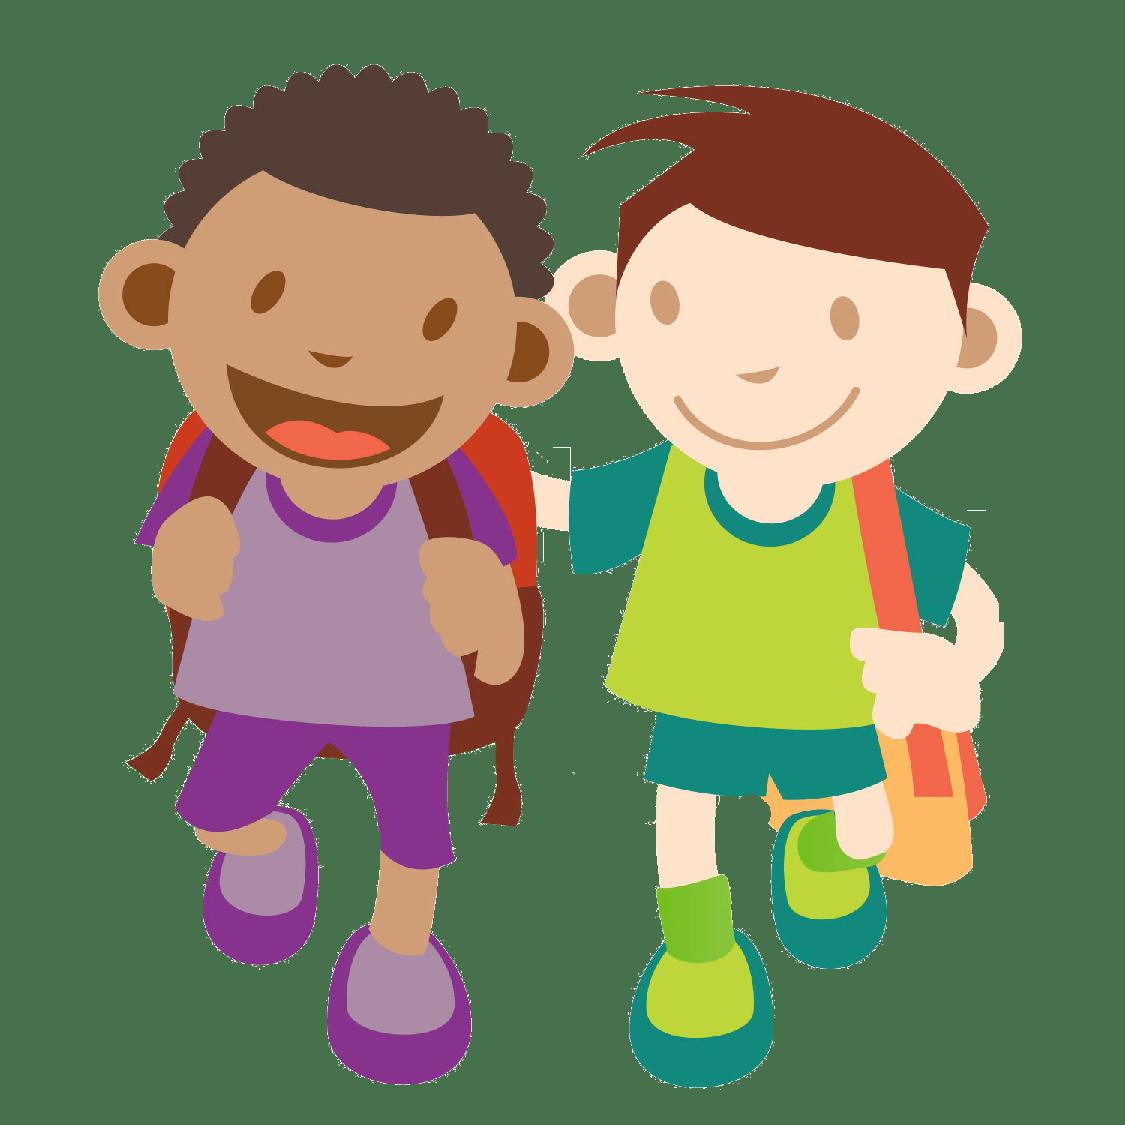 hight resolution of 1125x1125 kids walking clipart